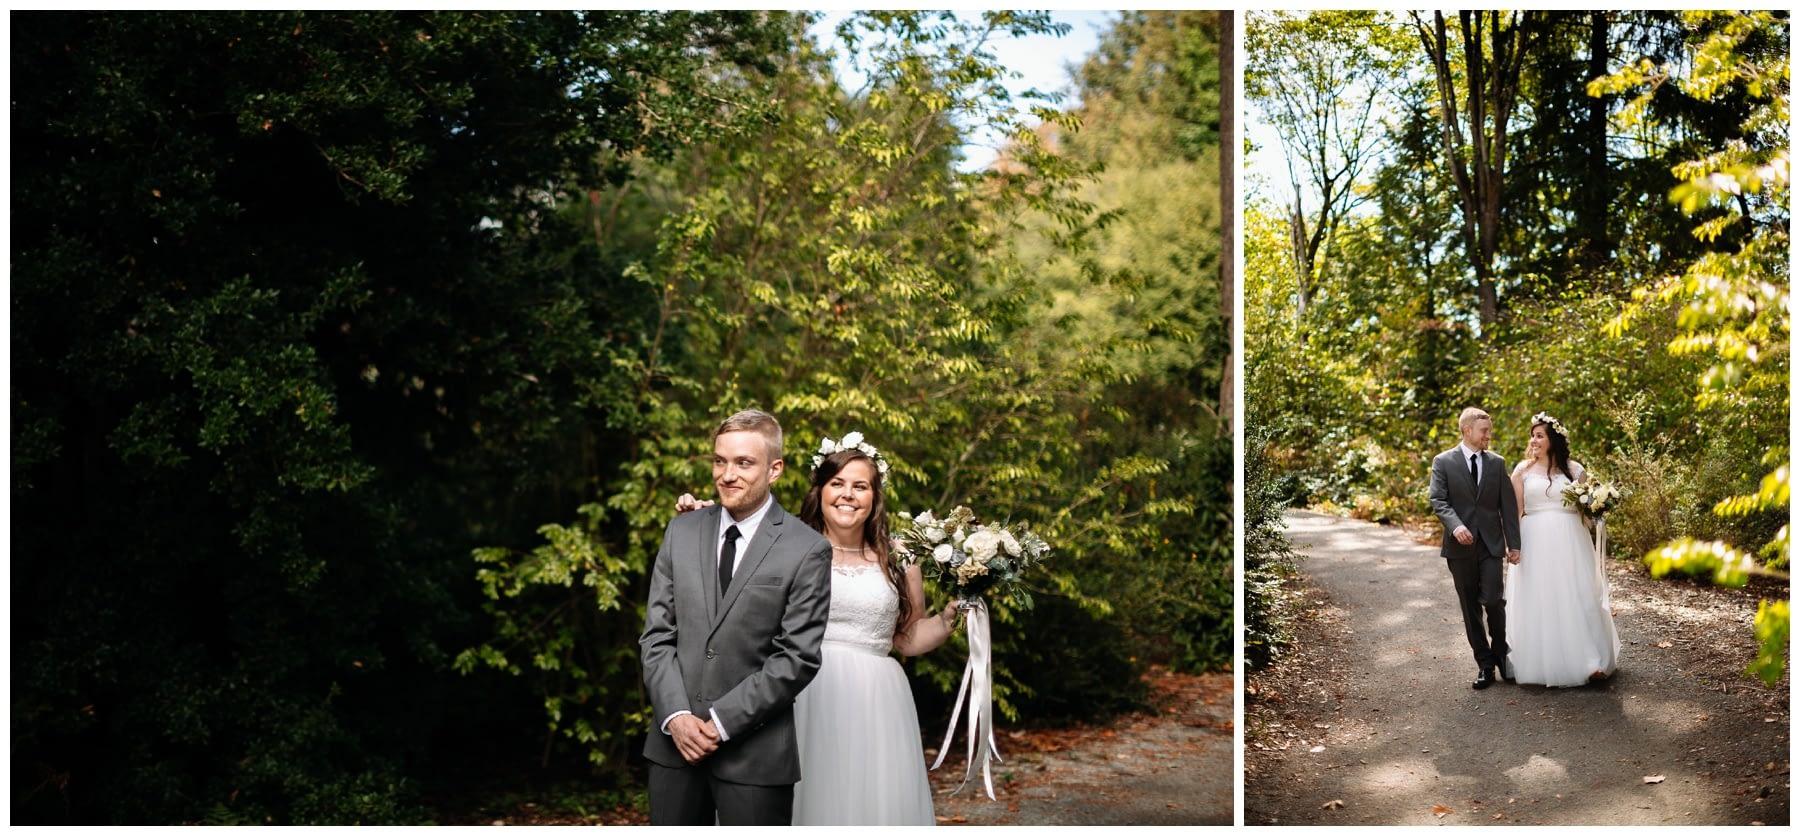 first look washington park arboretum wedding